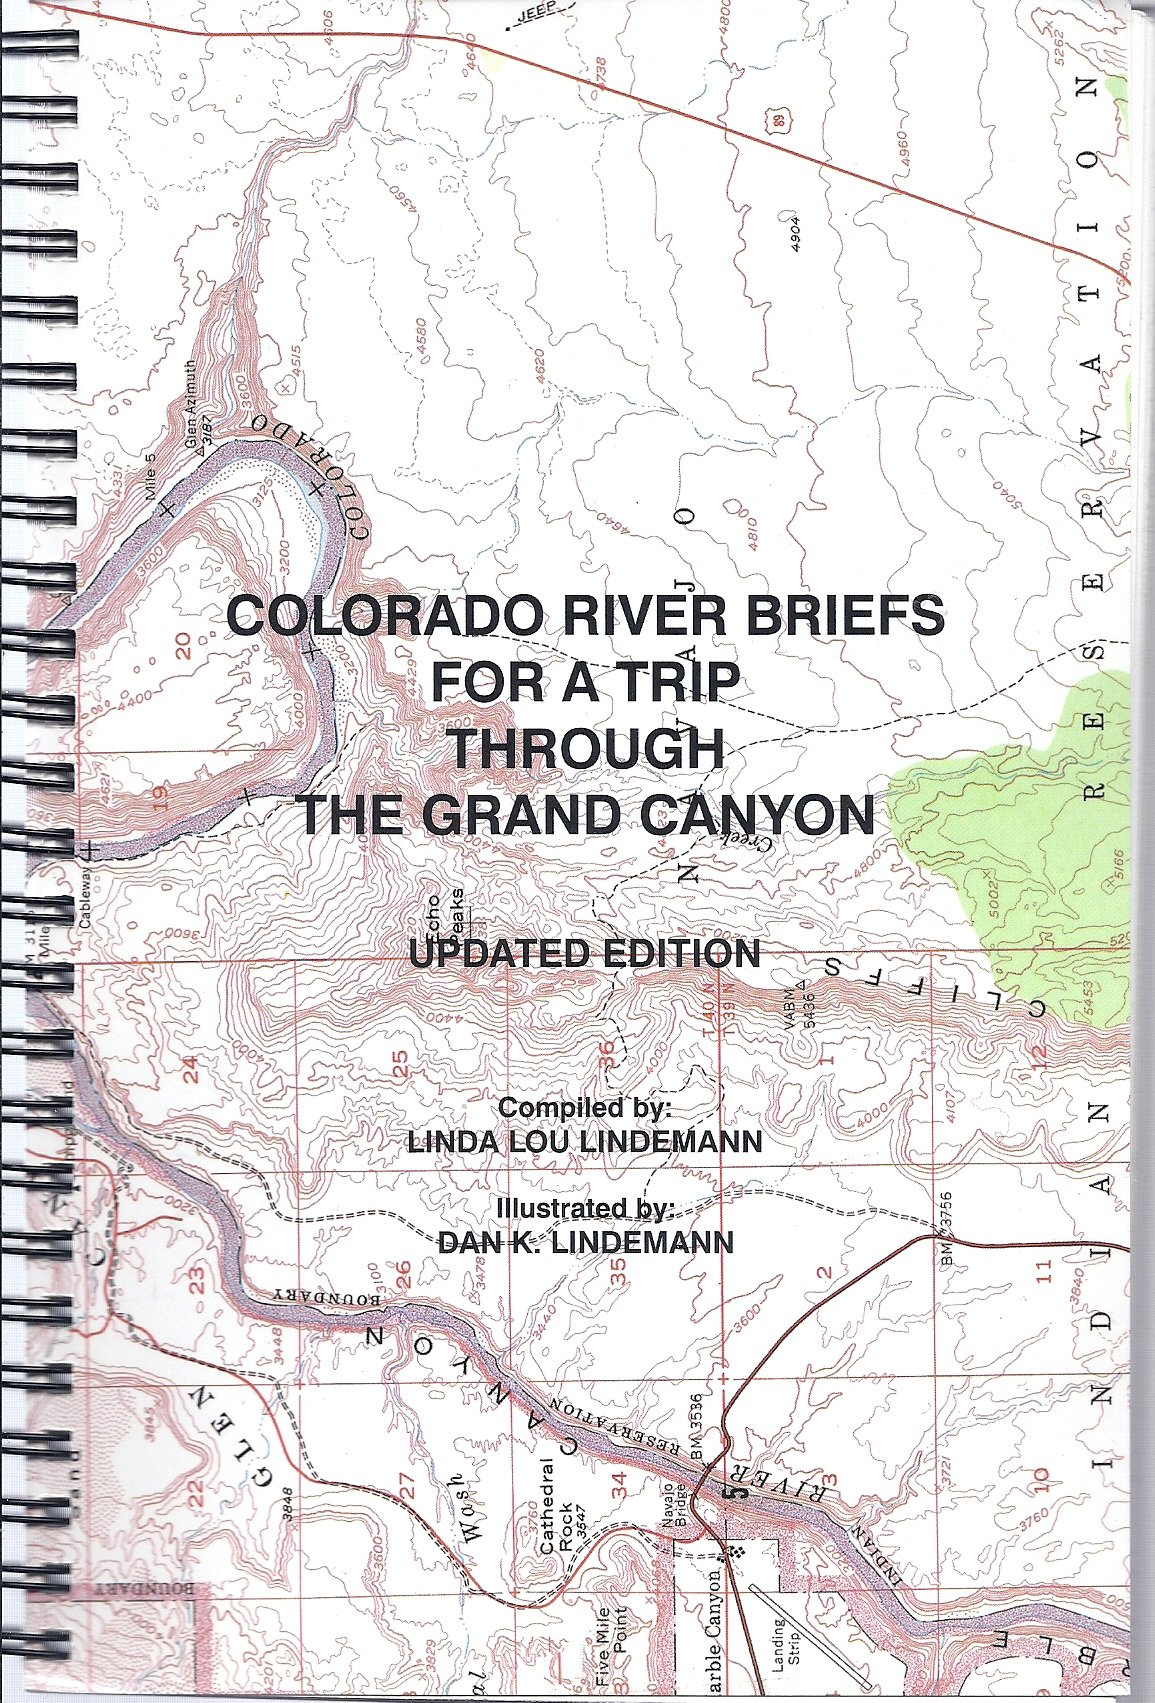 Colorado River Briefs for a Trip Through the Grand Canyon (Updated Edition), Linda Lou Lindemann